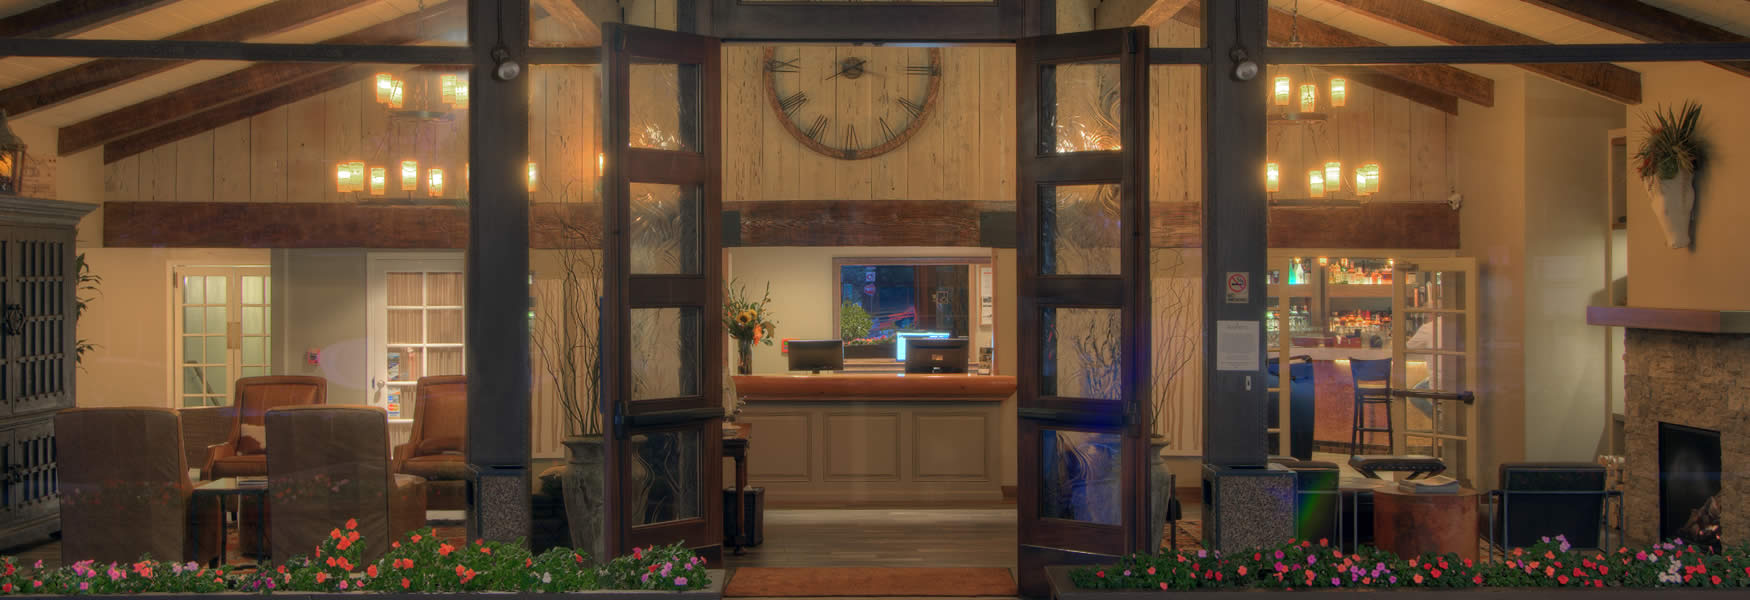 Santa Cruz Hotel | The Inn At Pasatiempo